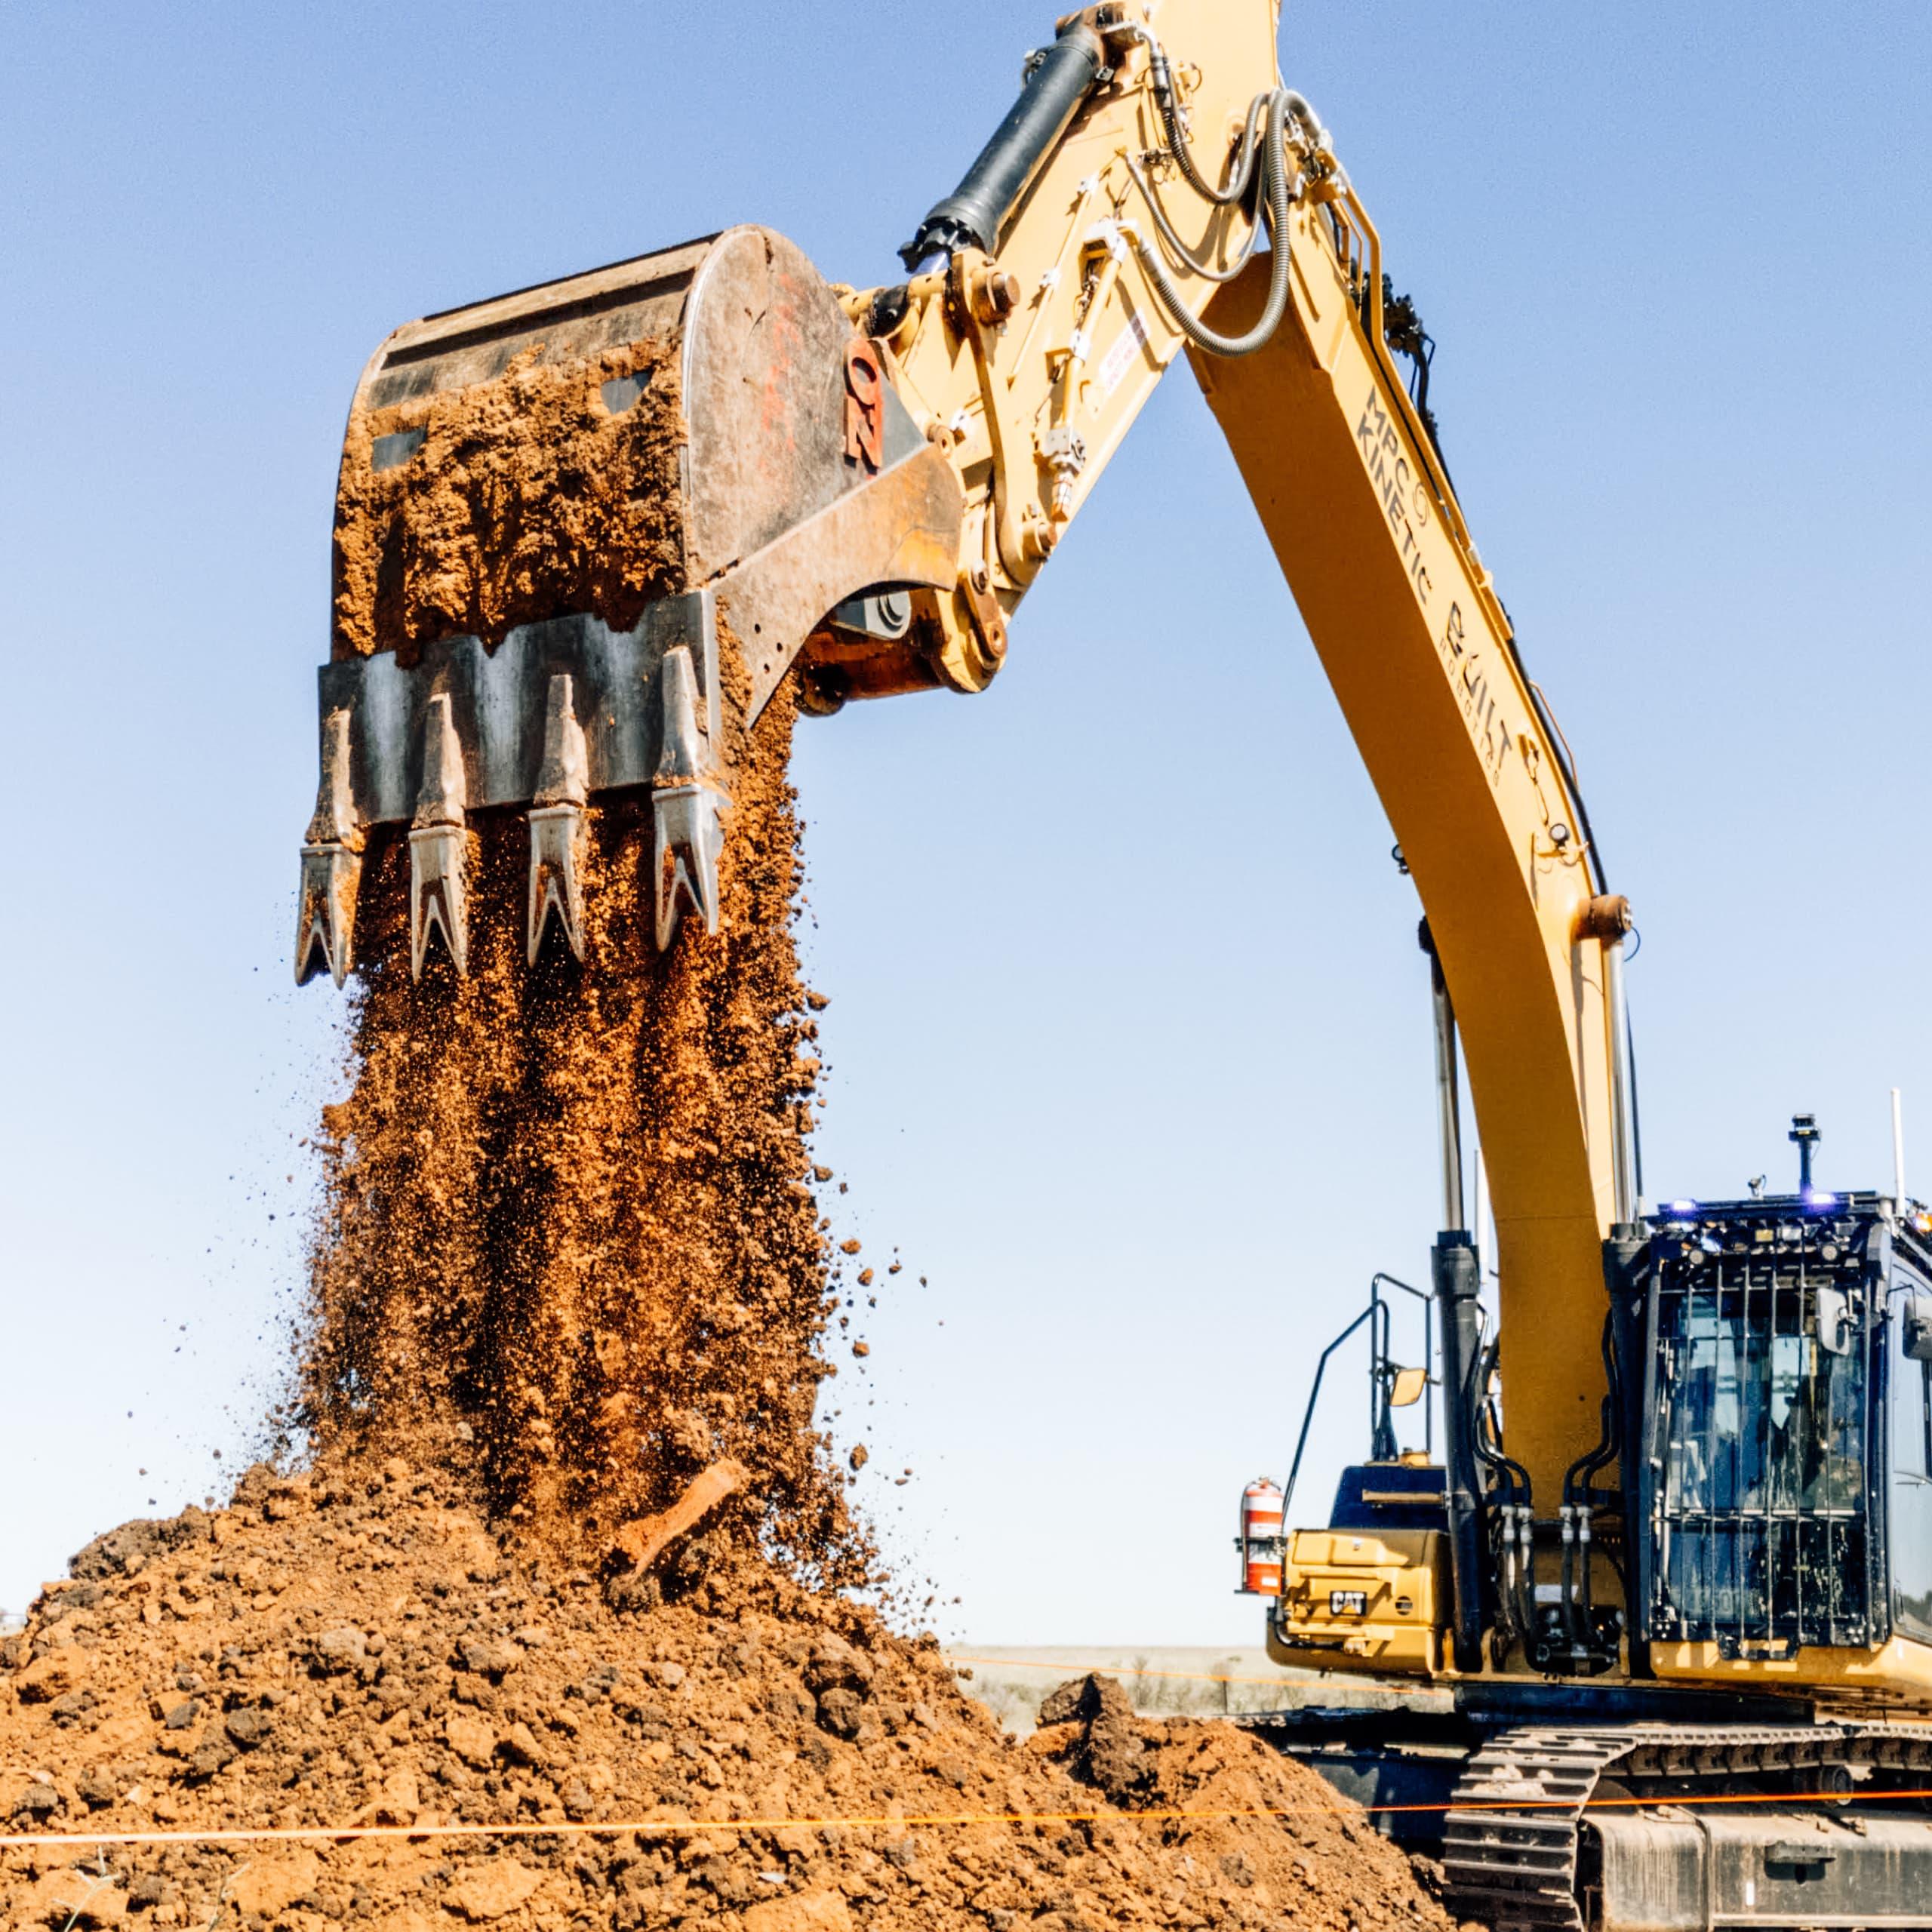 Working excavator uptime